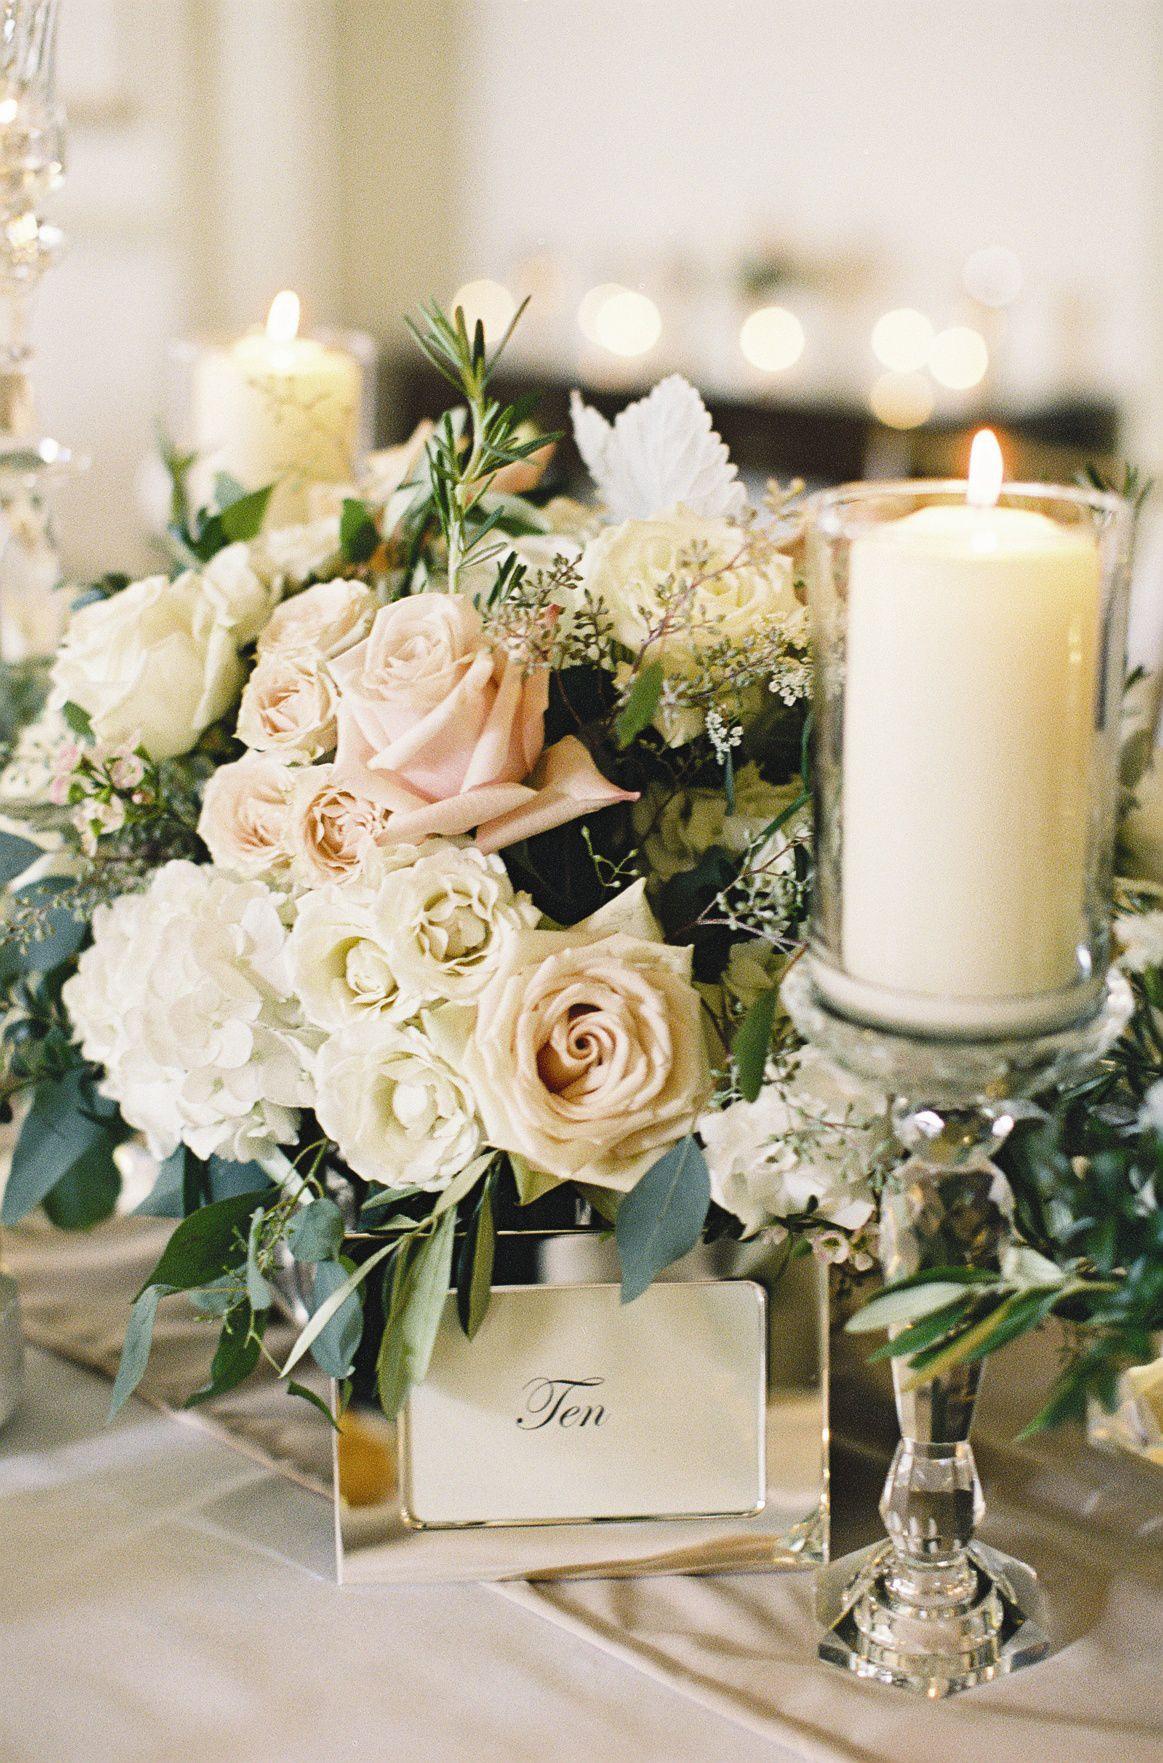 Round Vase Flower Arrangements Of 26 Most Insta Worthy Flower Ideas Weve Ever Seen Intended for Dfa17dfb Ddb2 49c1 B7b4 72b07a7887ae